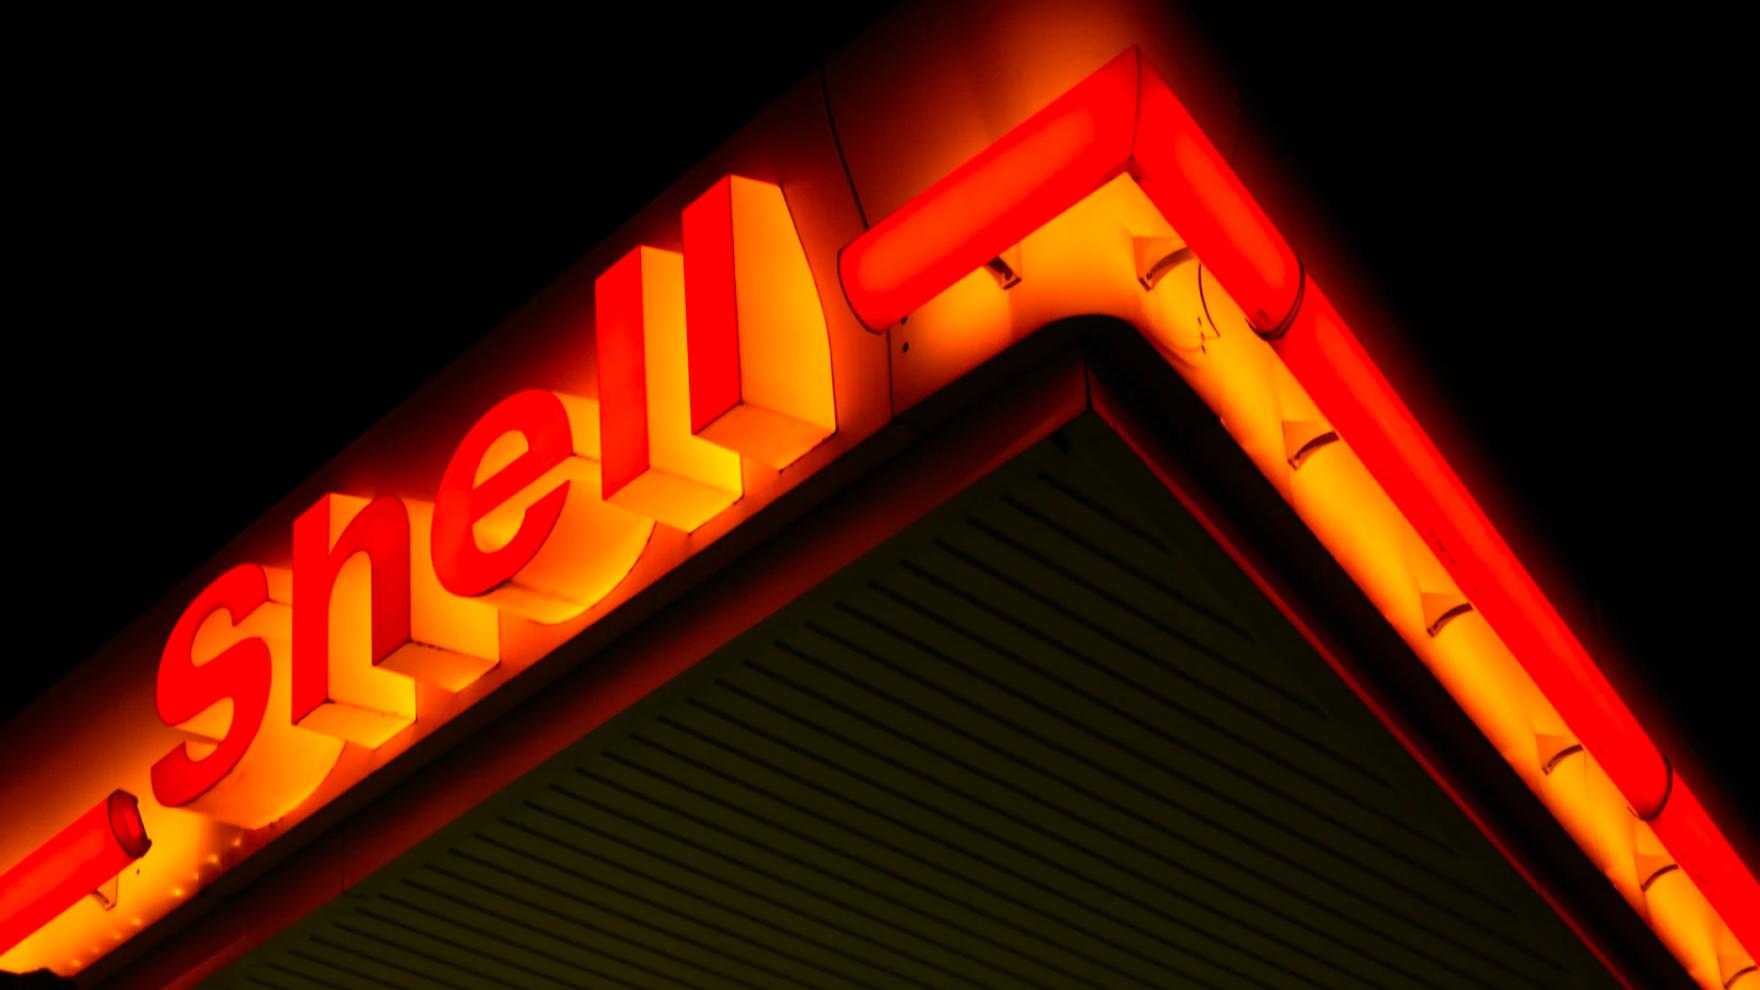 Shell_1760x990